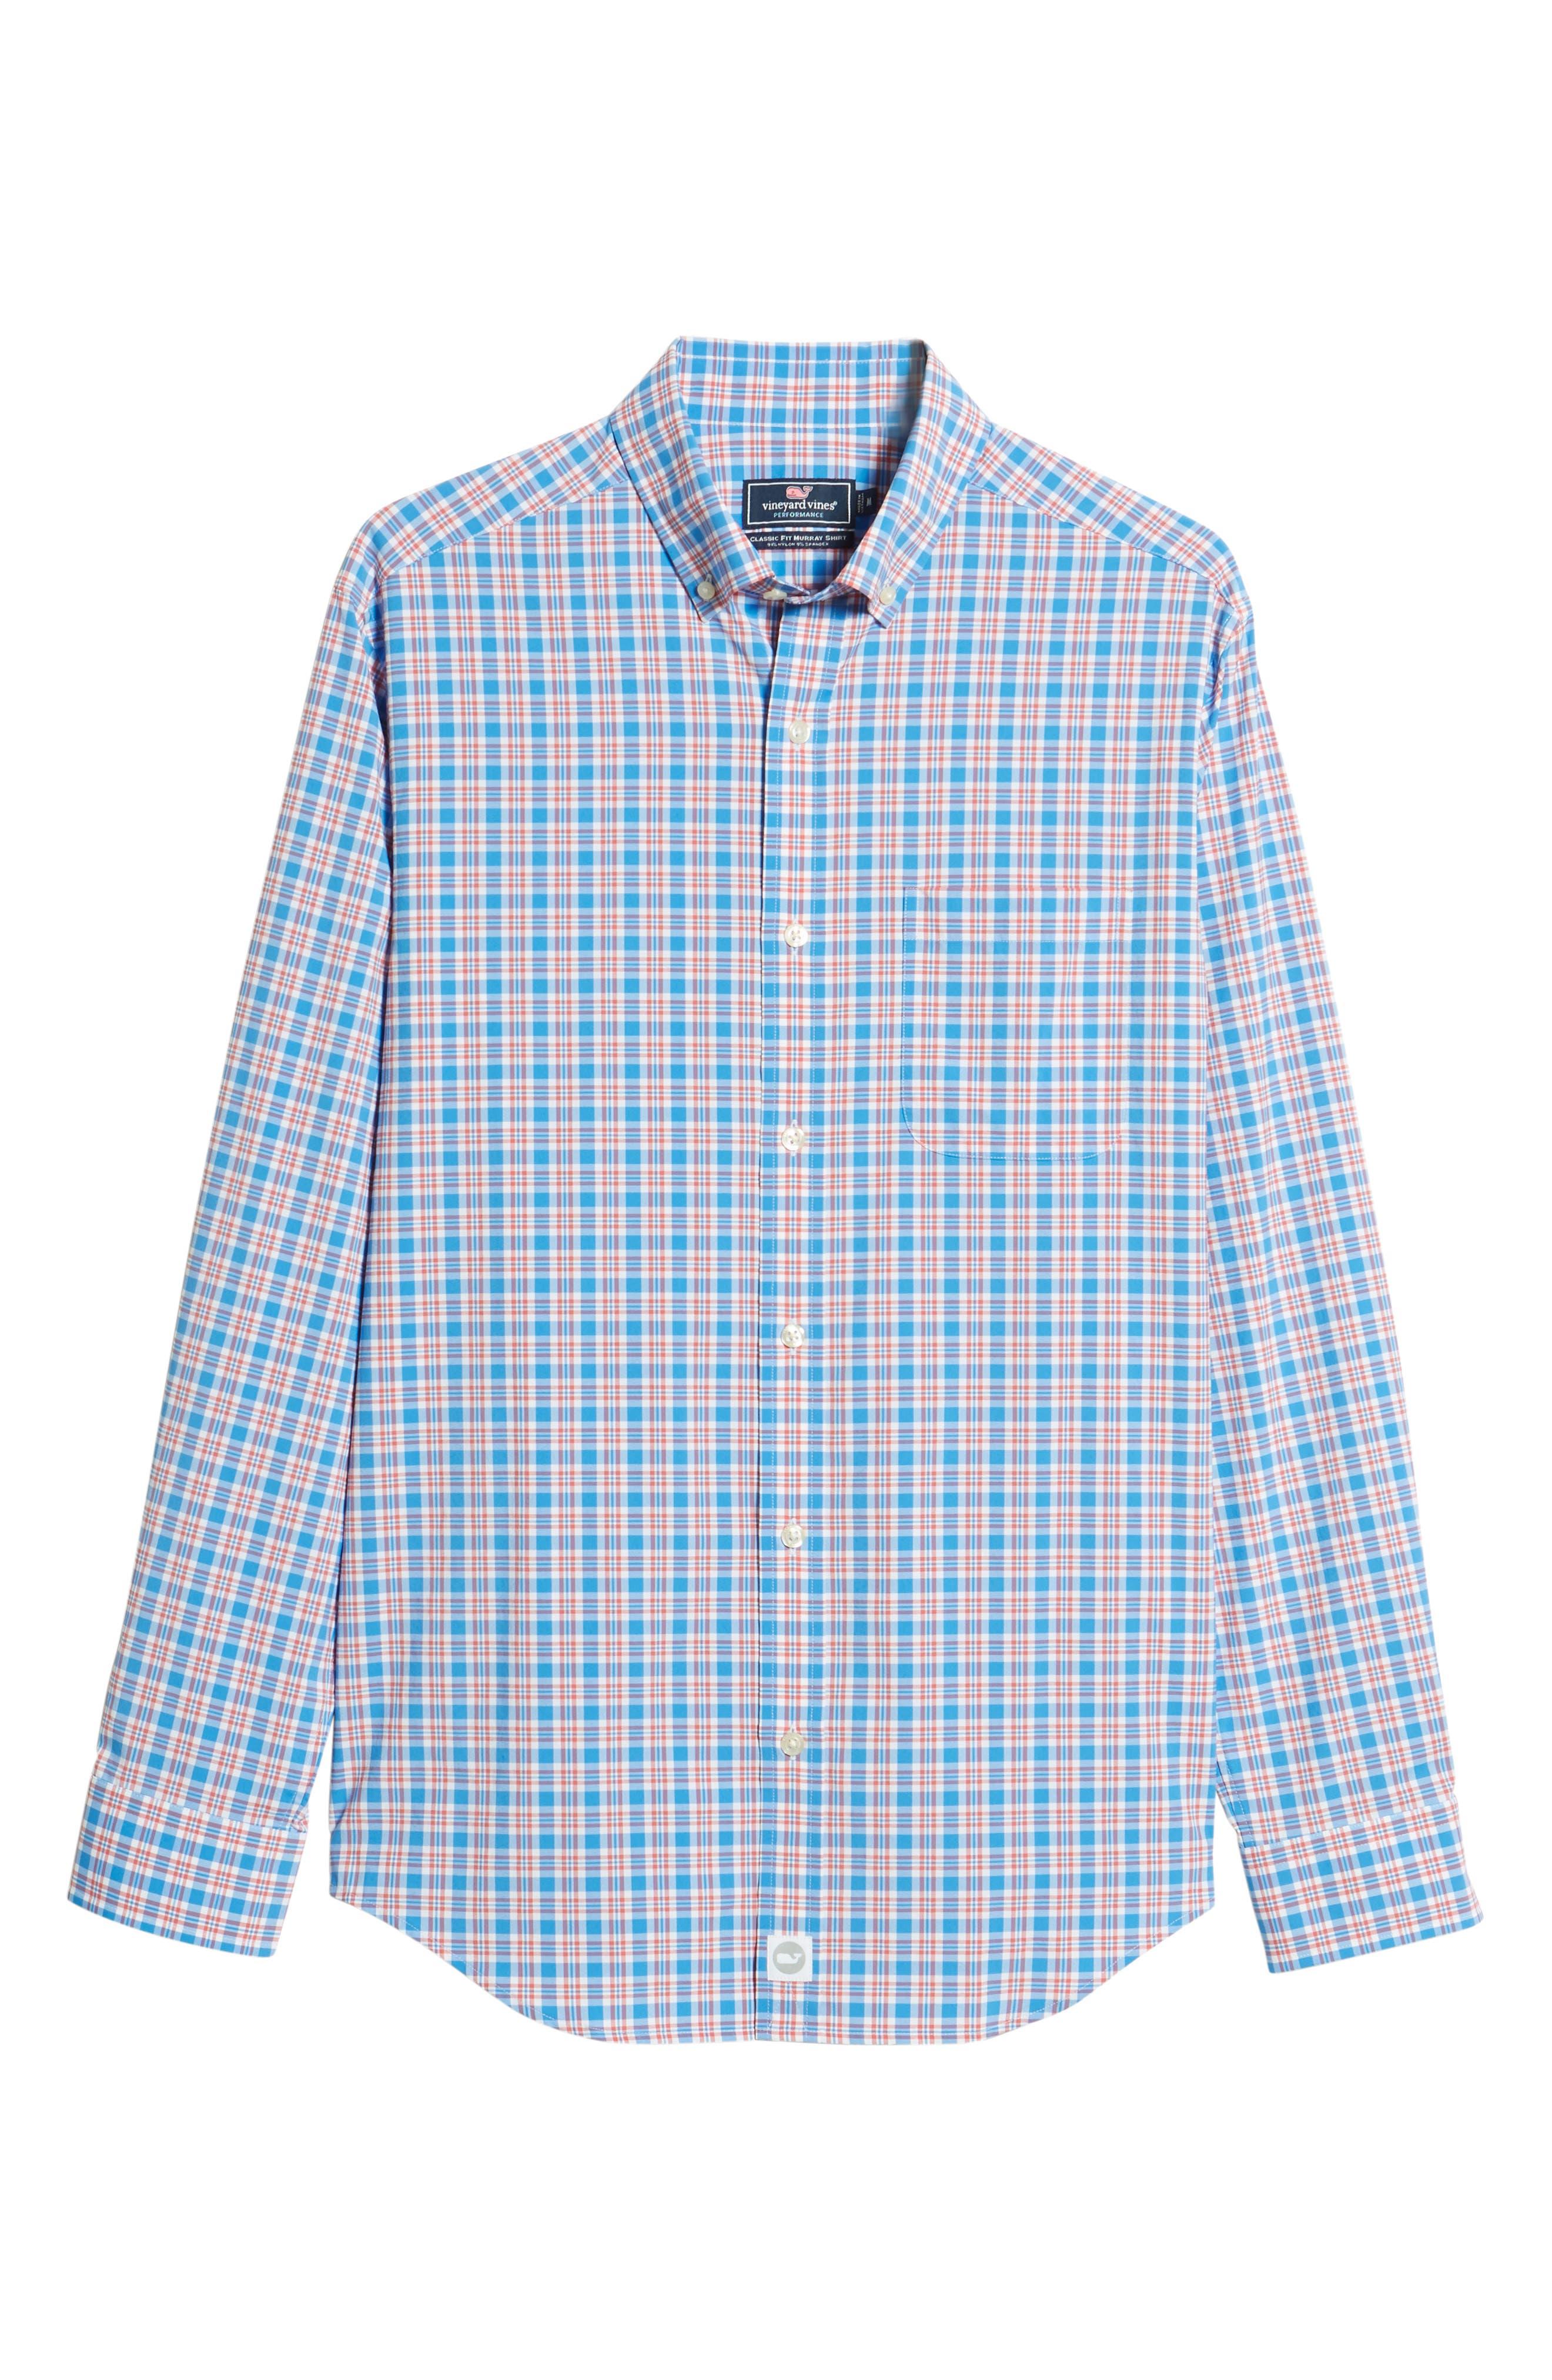 Lighthouse Road Regular Fit Plaid Sport Shirt,                             Alternate thumbnail 5, color,                             Hull Blue